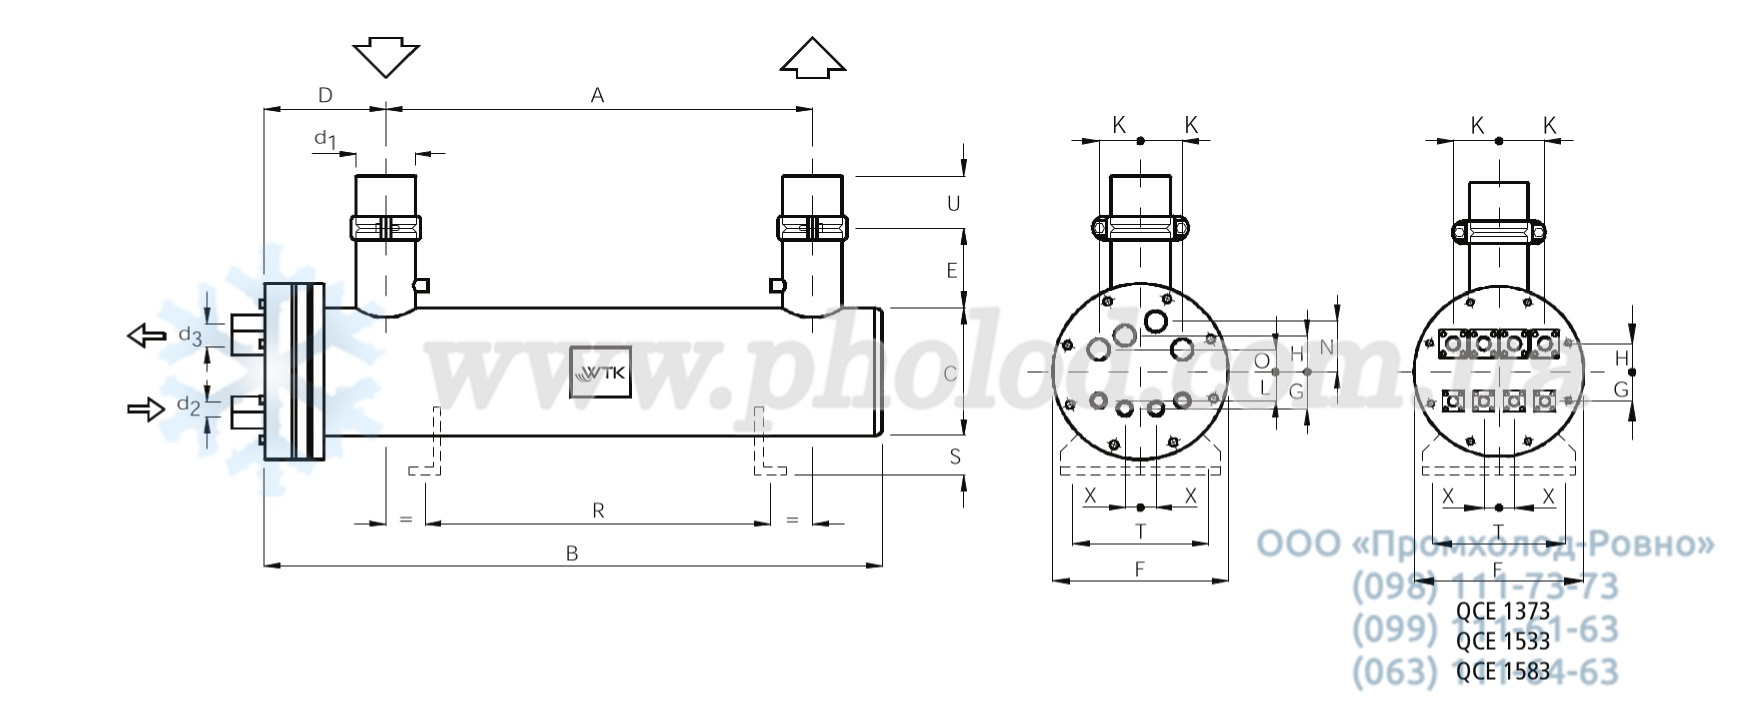 Кожухотрубный испаритель WTK QCE 1373 Артём Пластины теплообменника КС 57 Бийск